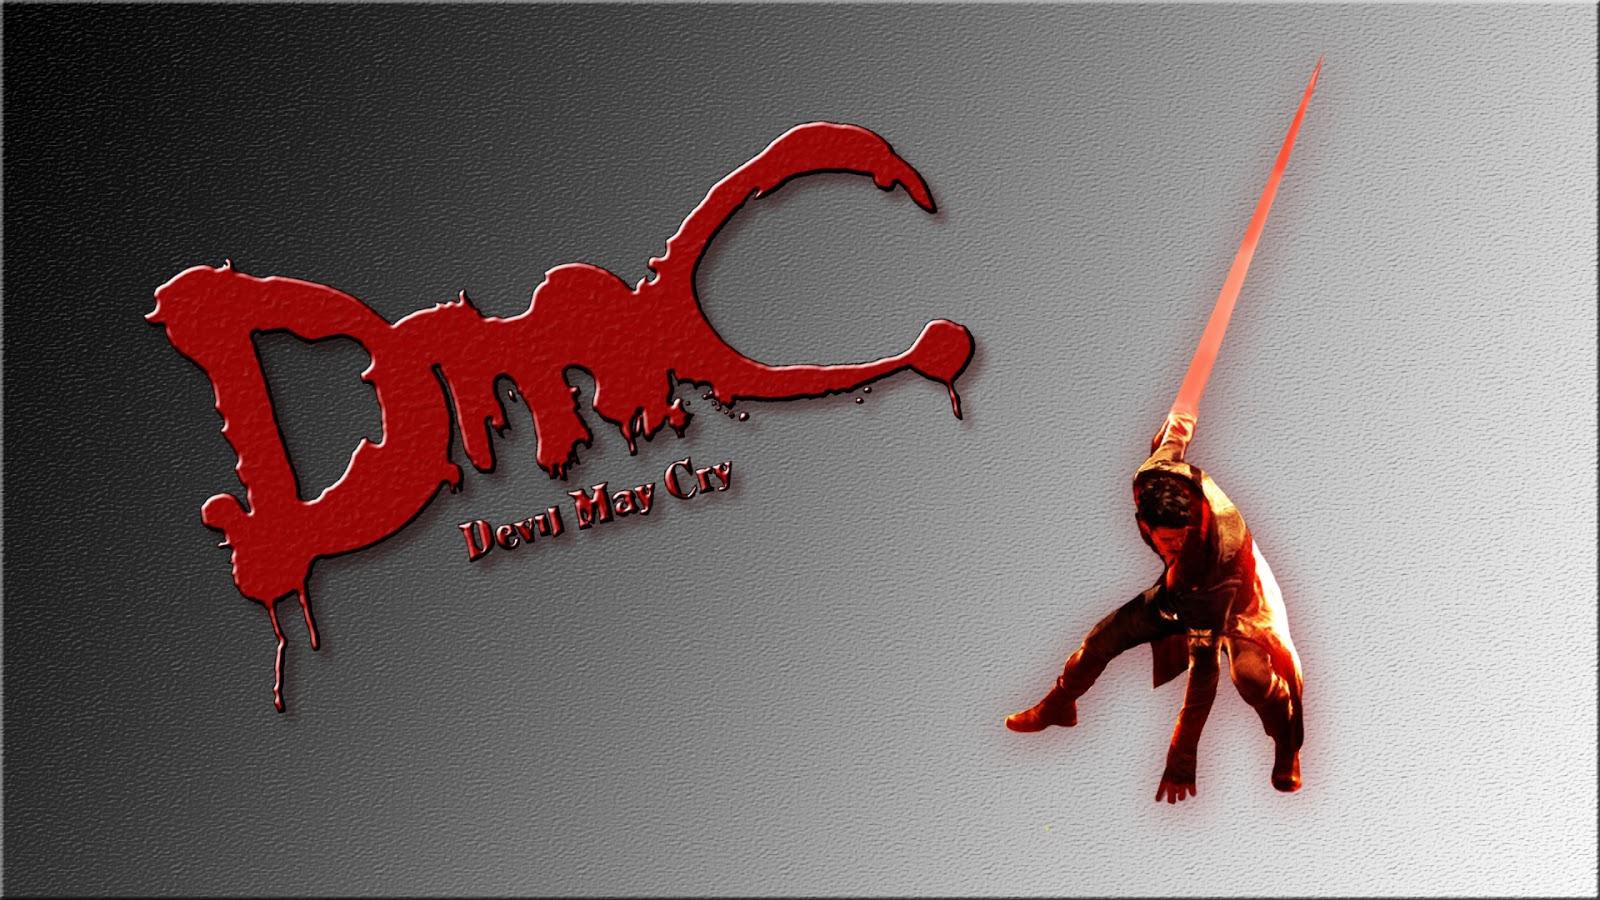 Dmc 5 Dante Wallpaper Free Download Imb Show